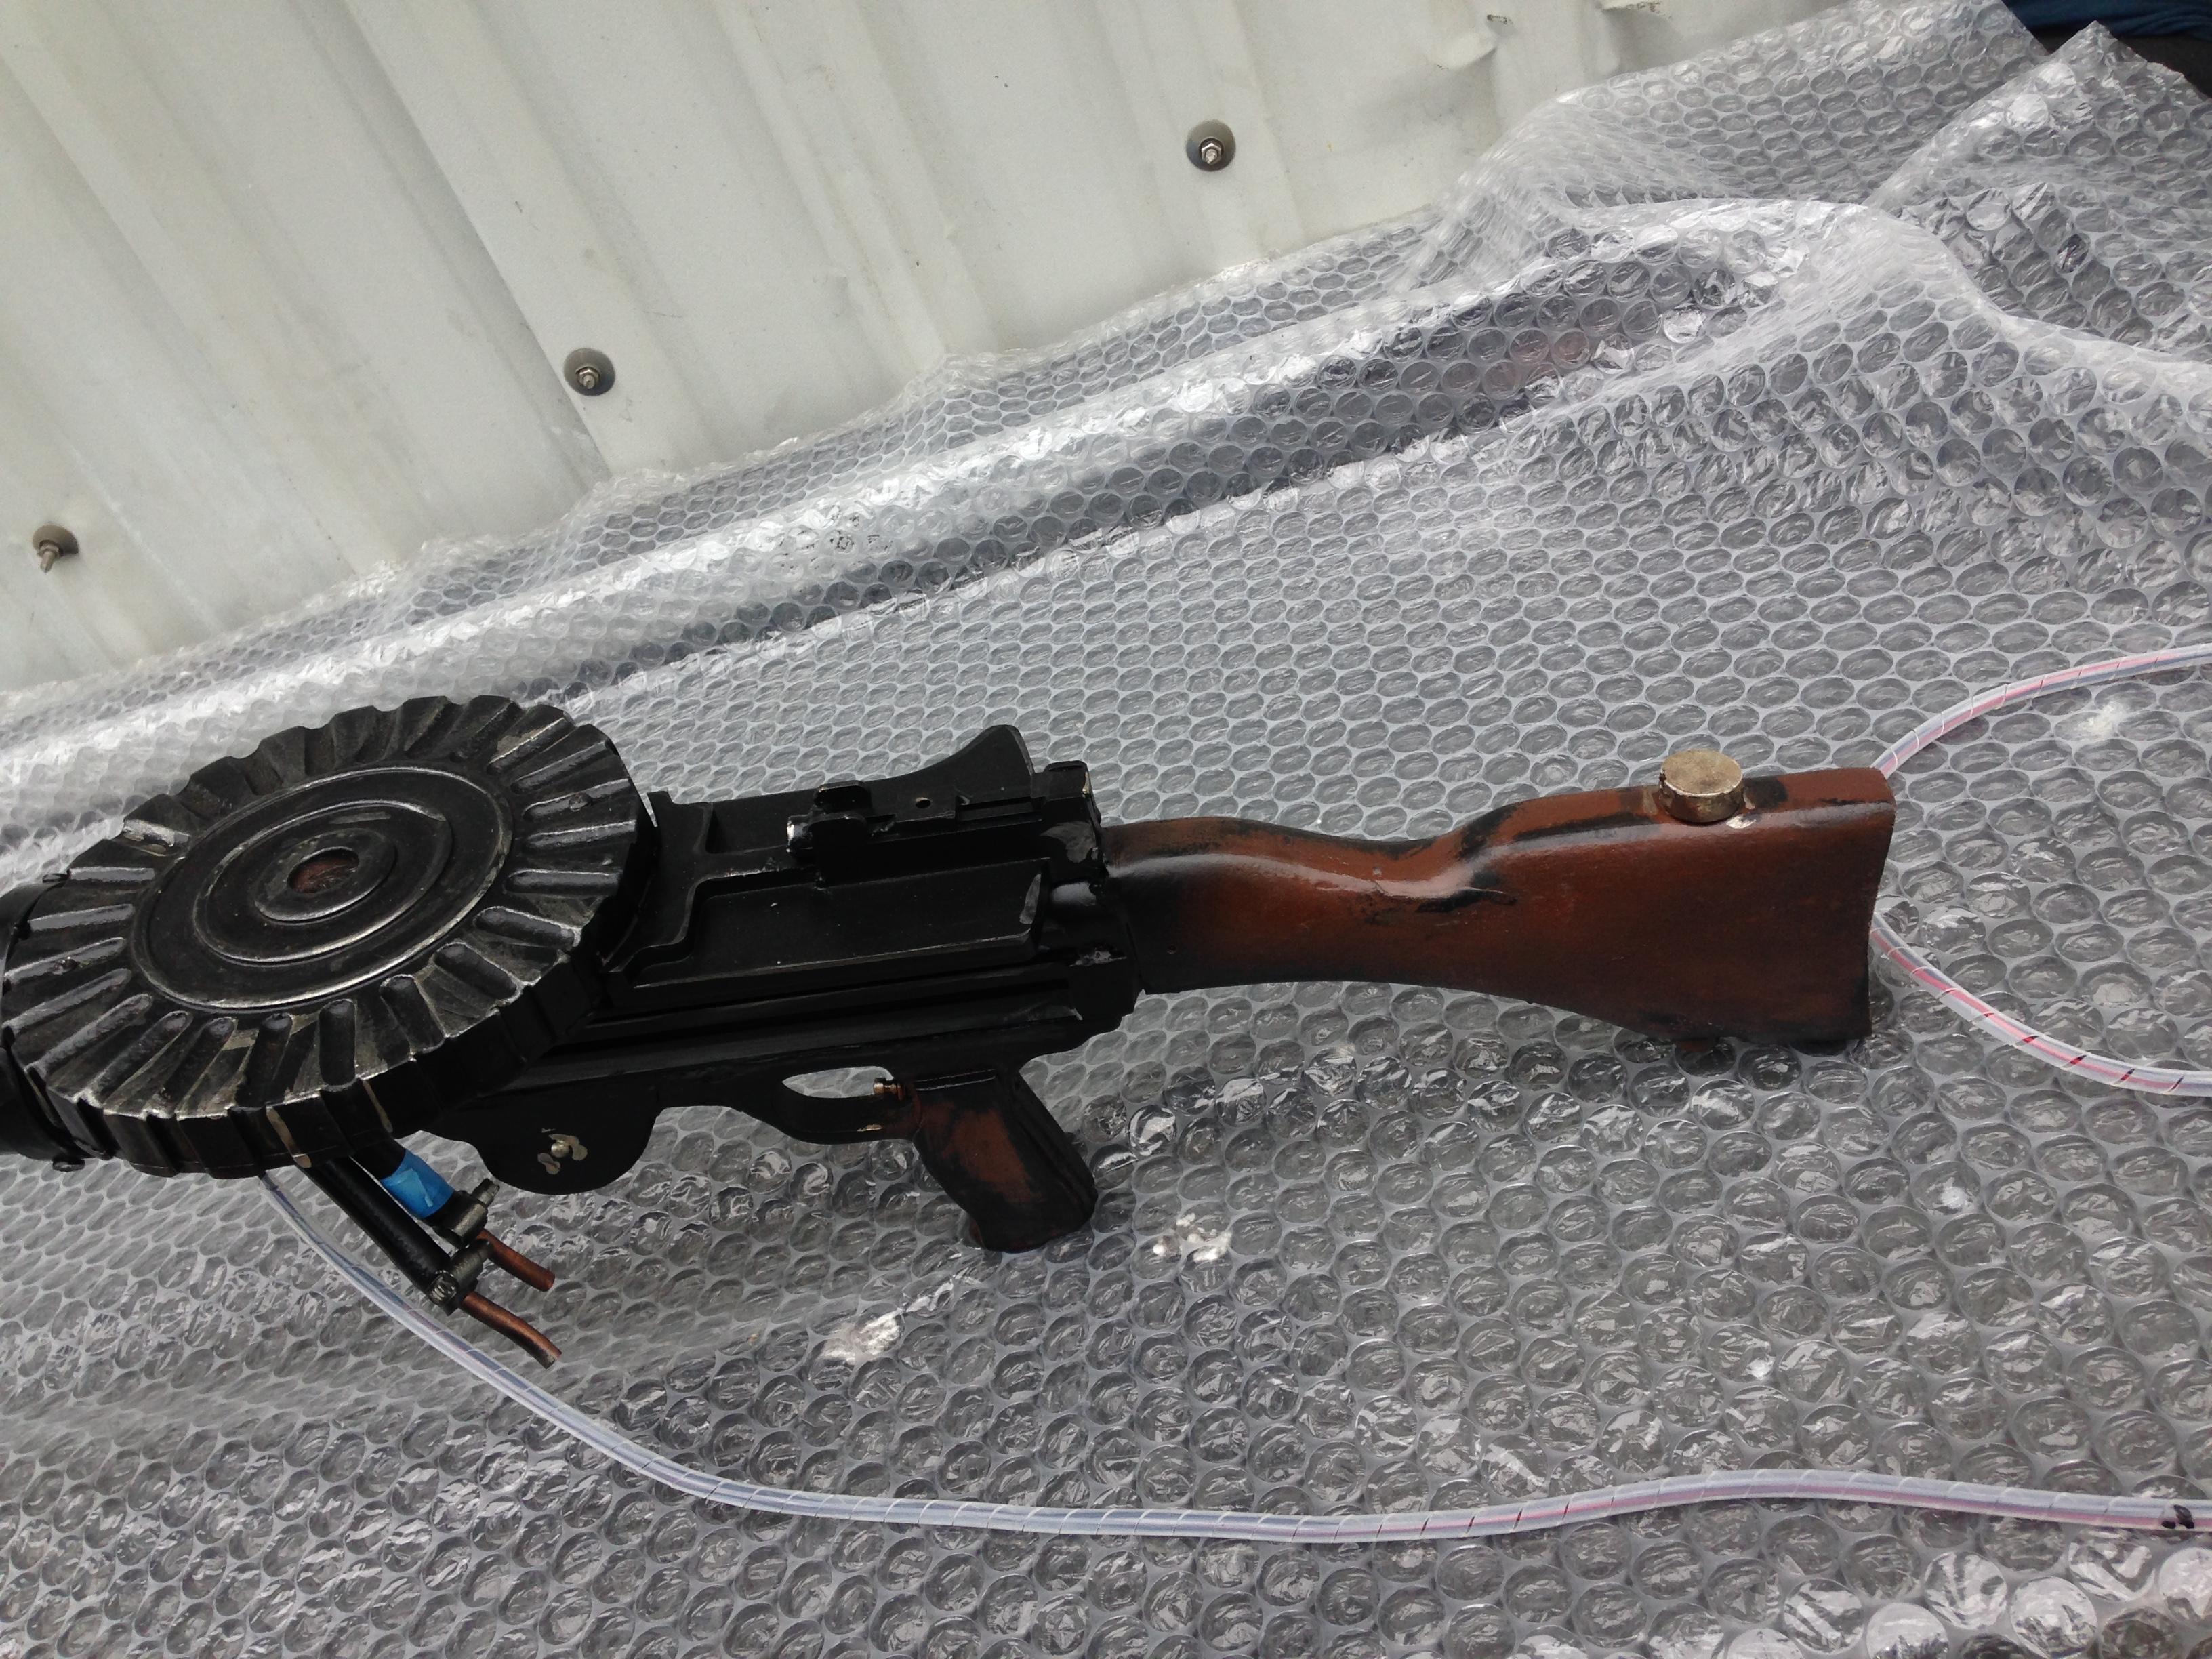 MILITARY MUCKABOUTS - Simulated Firing Guns